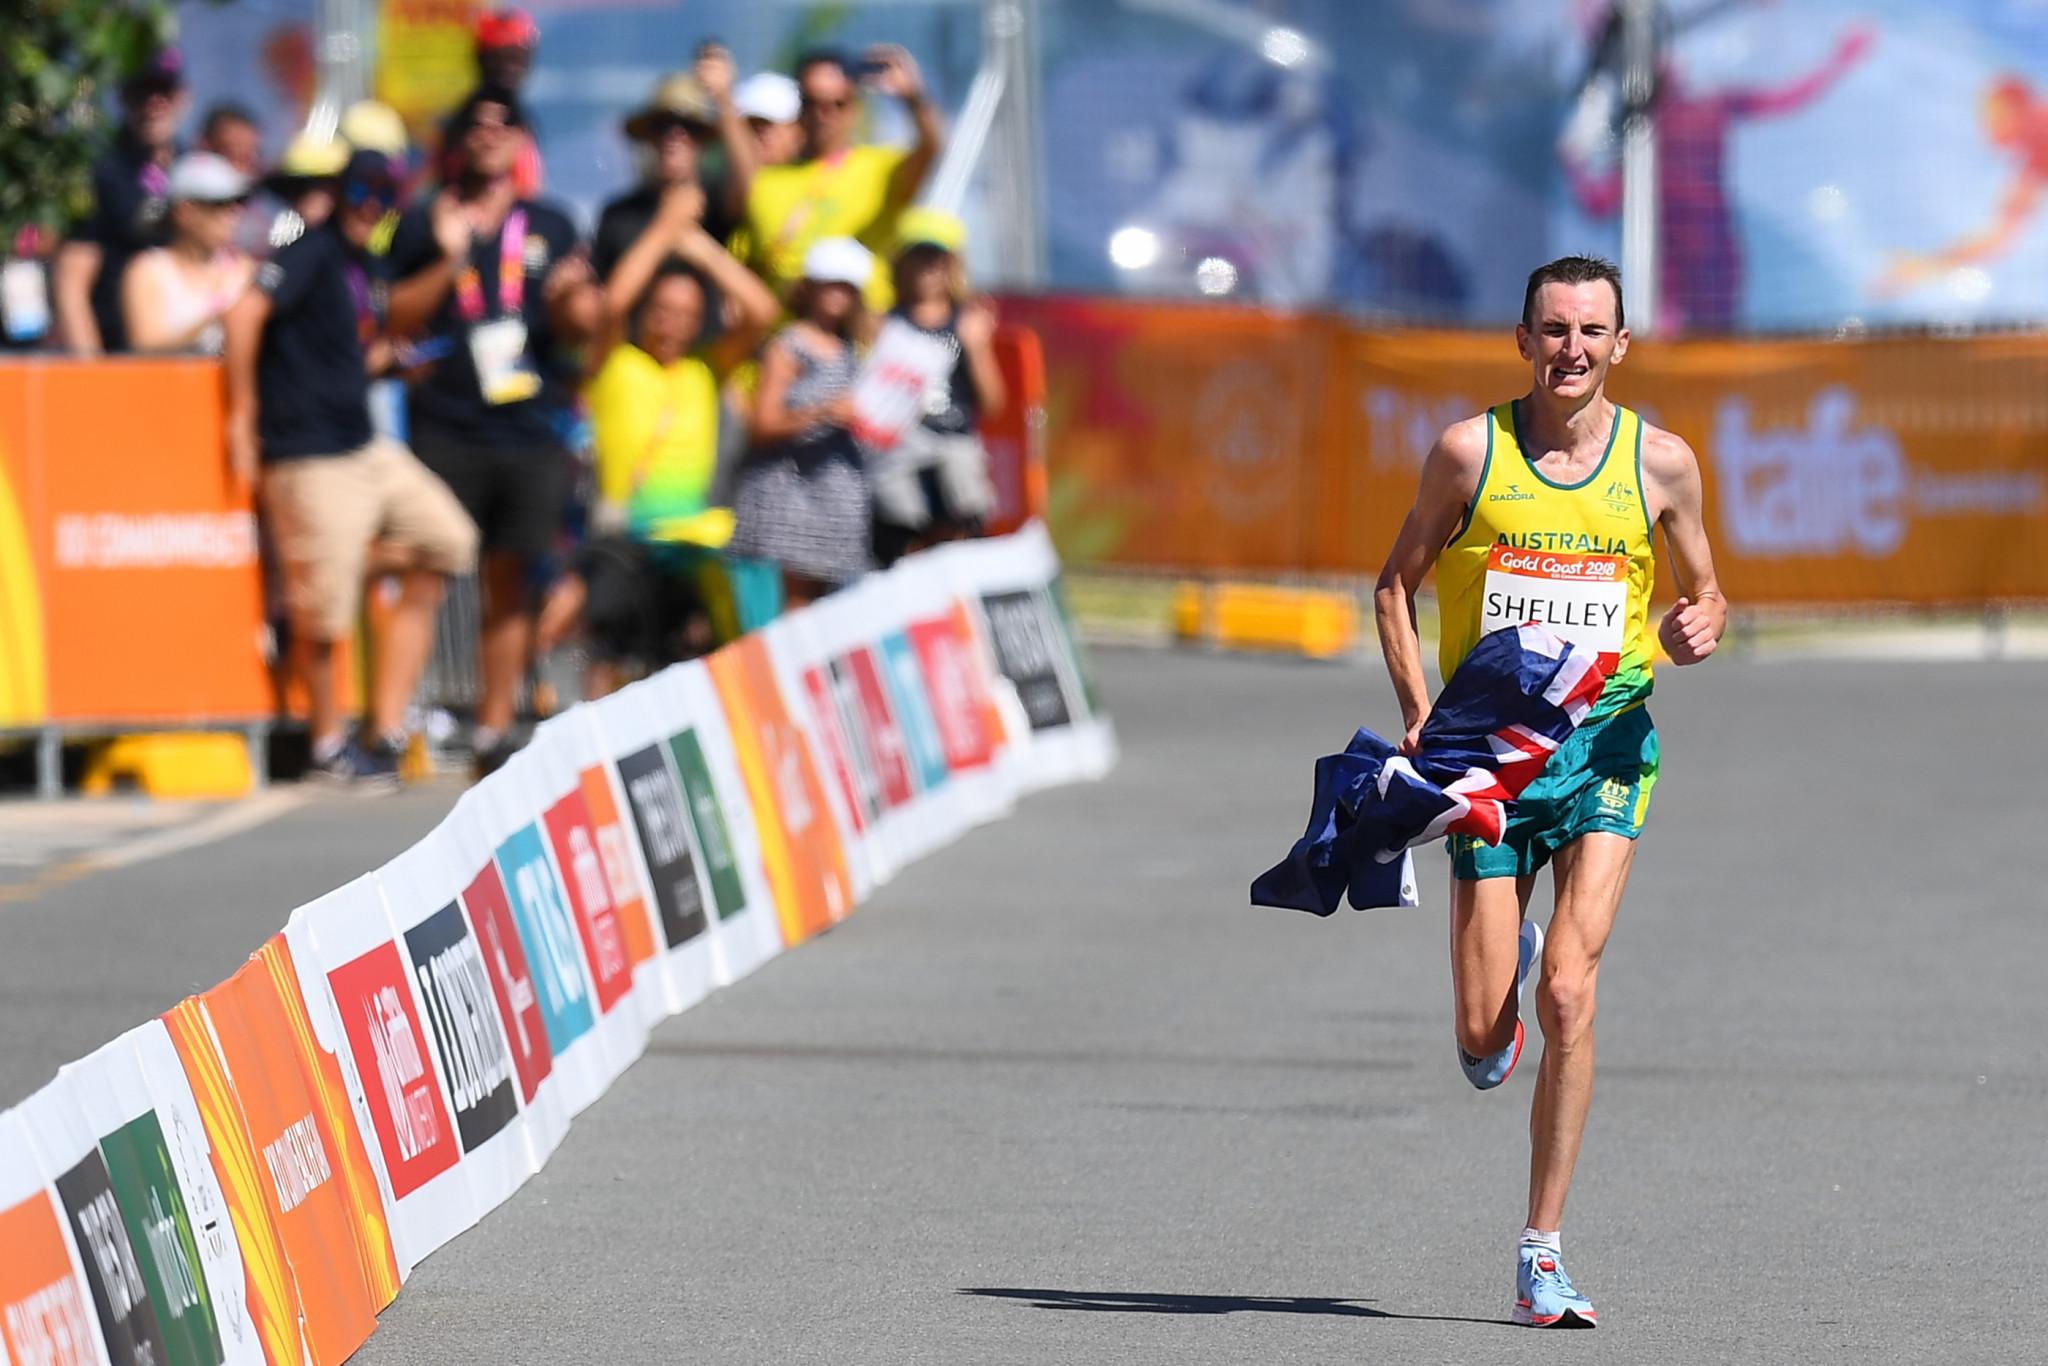 Shelley defends men's marathon title after leader Hawkins collapses near finish